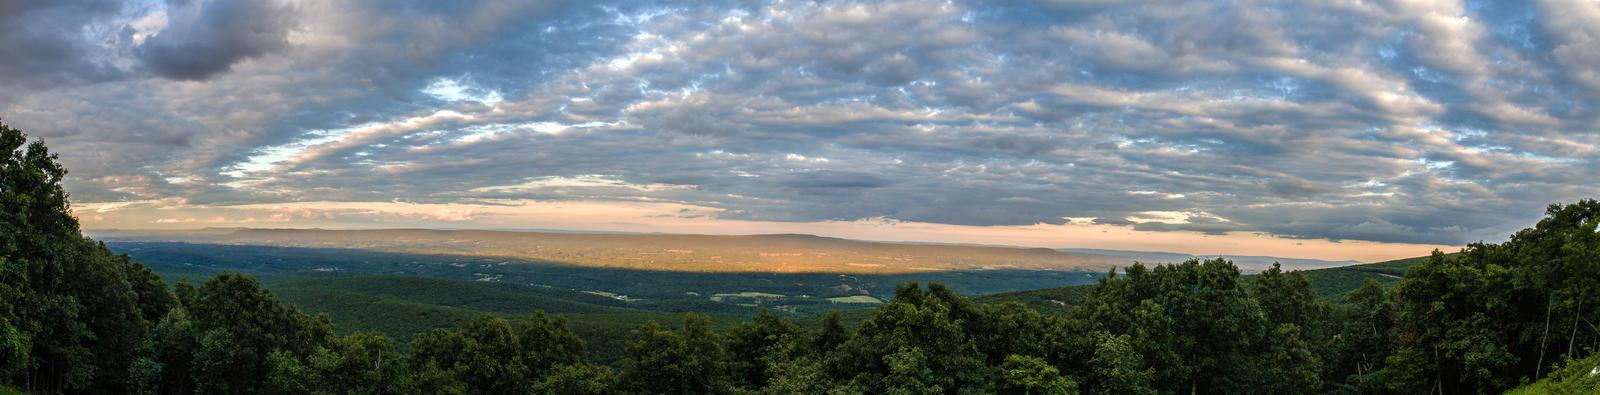 Overlook Landscape